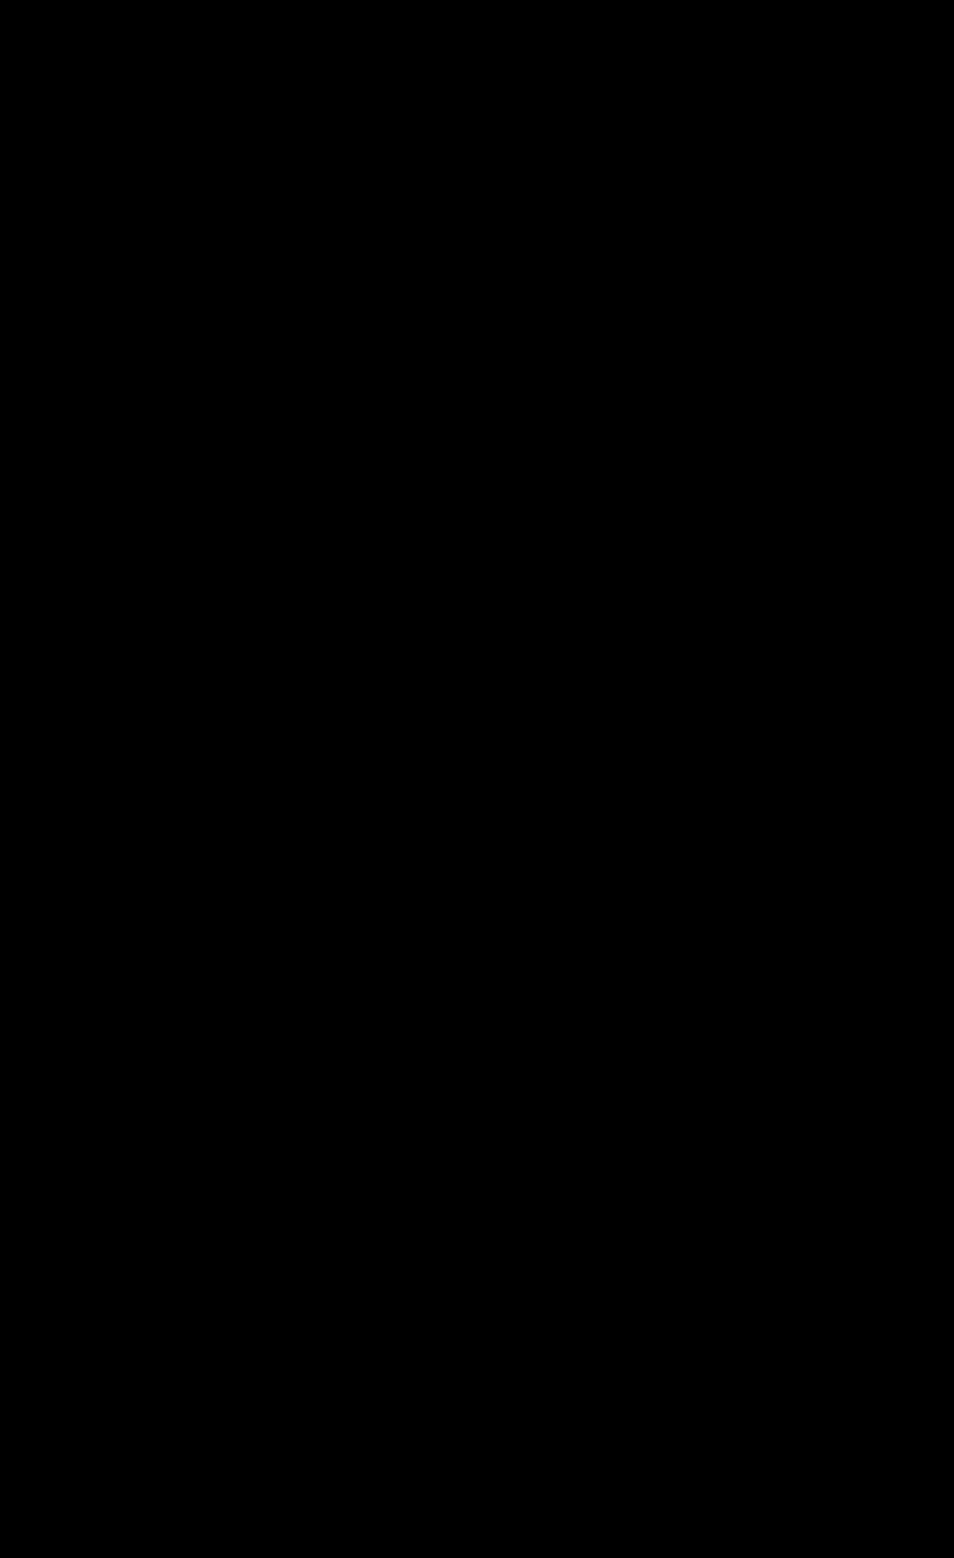 Simbolo Do Whatsapp Png Clip Transparent Stock.